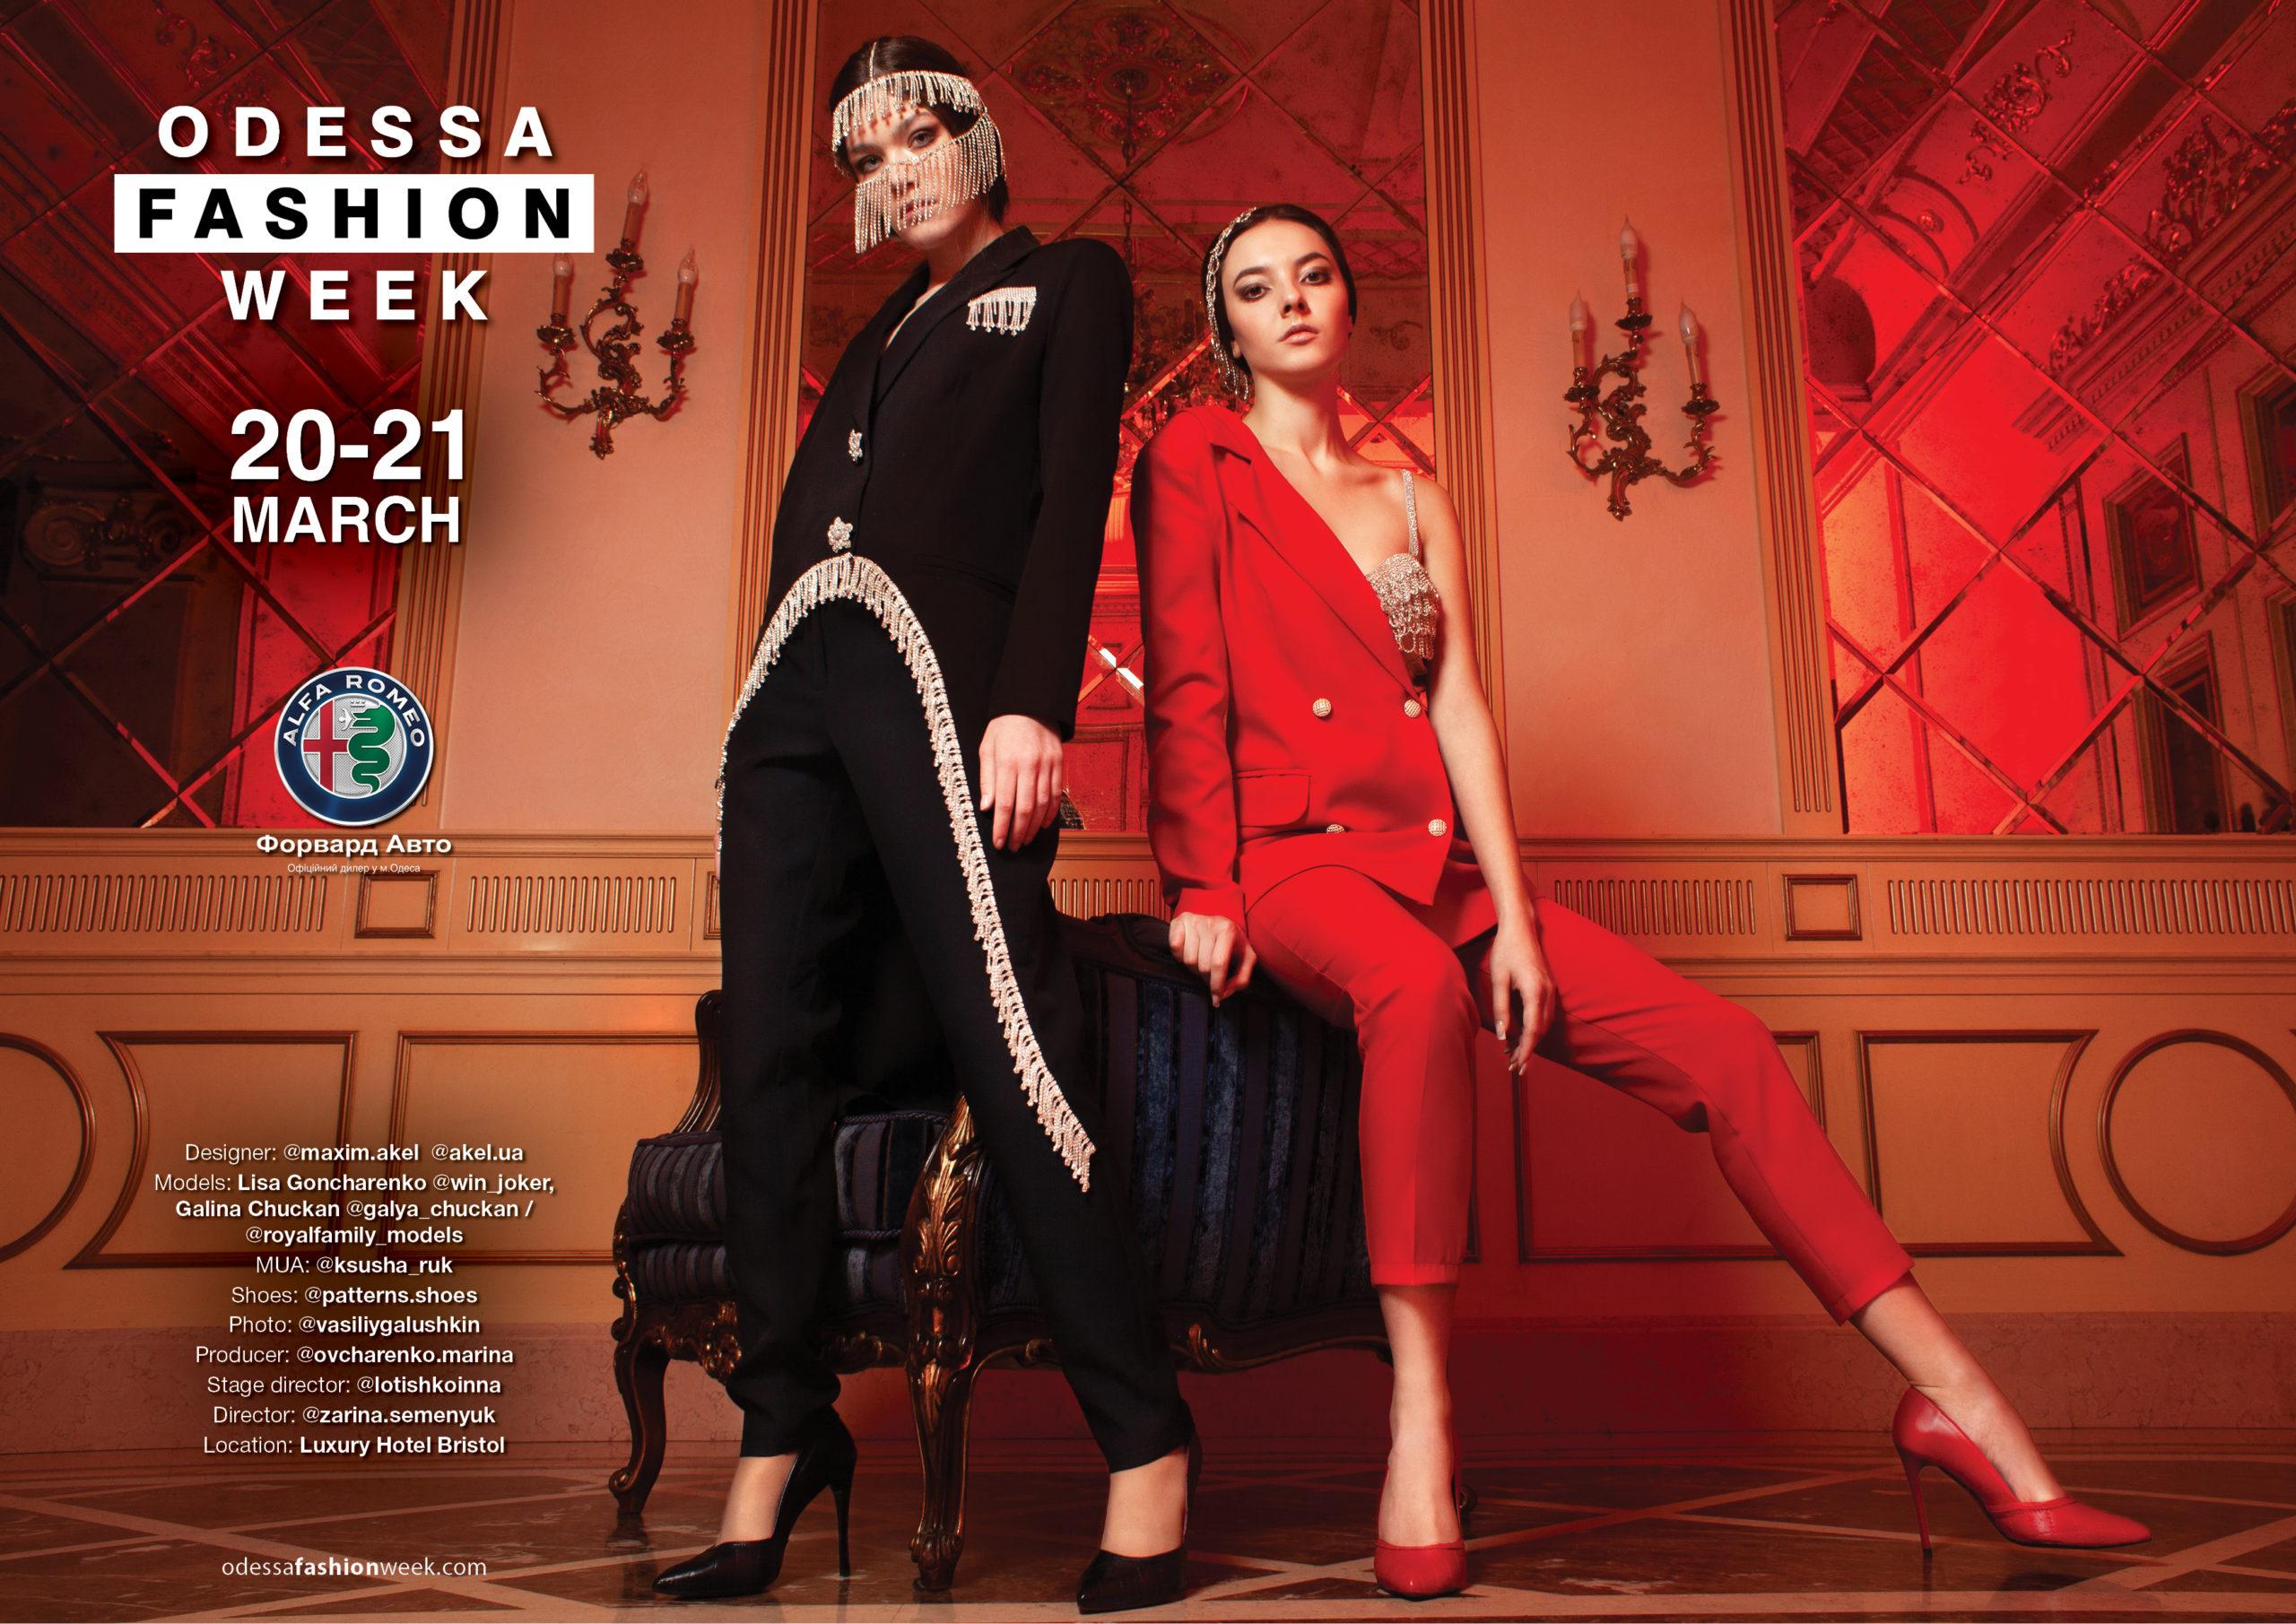 Odessa Fashion Week: New Season 2021